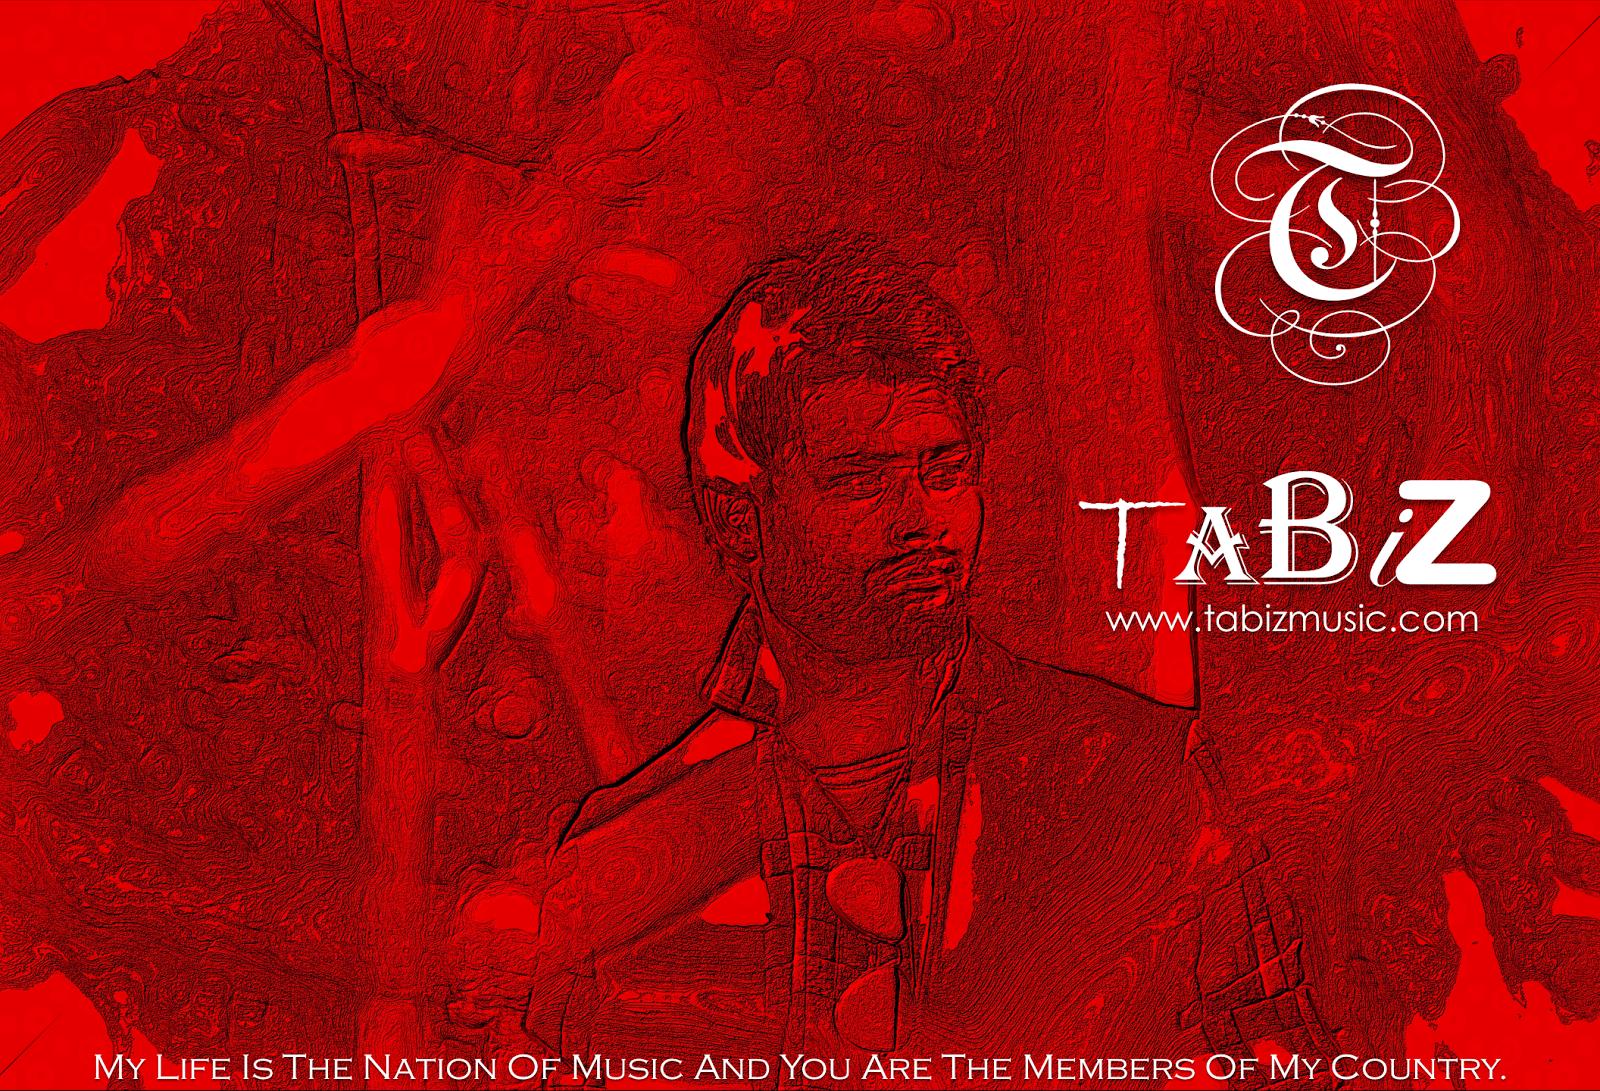 TaBiz (Artistic Photograph And Logo)